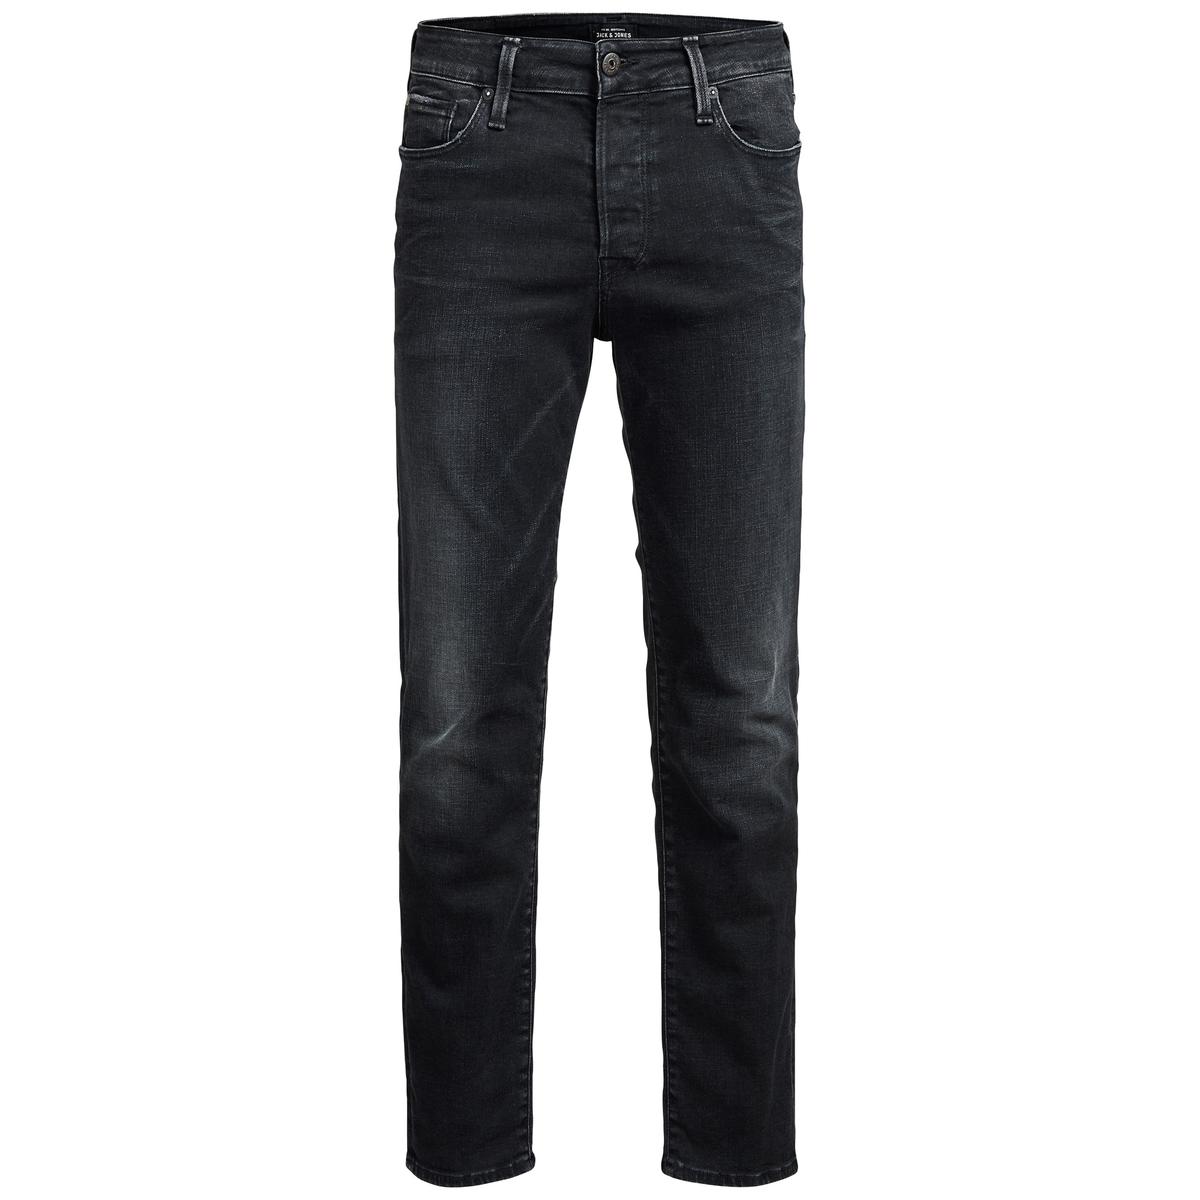 Jeans corte clássico, regular